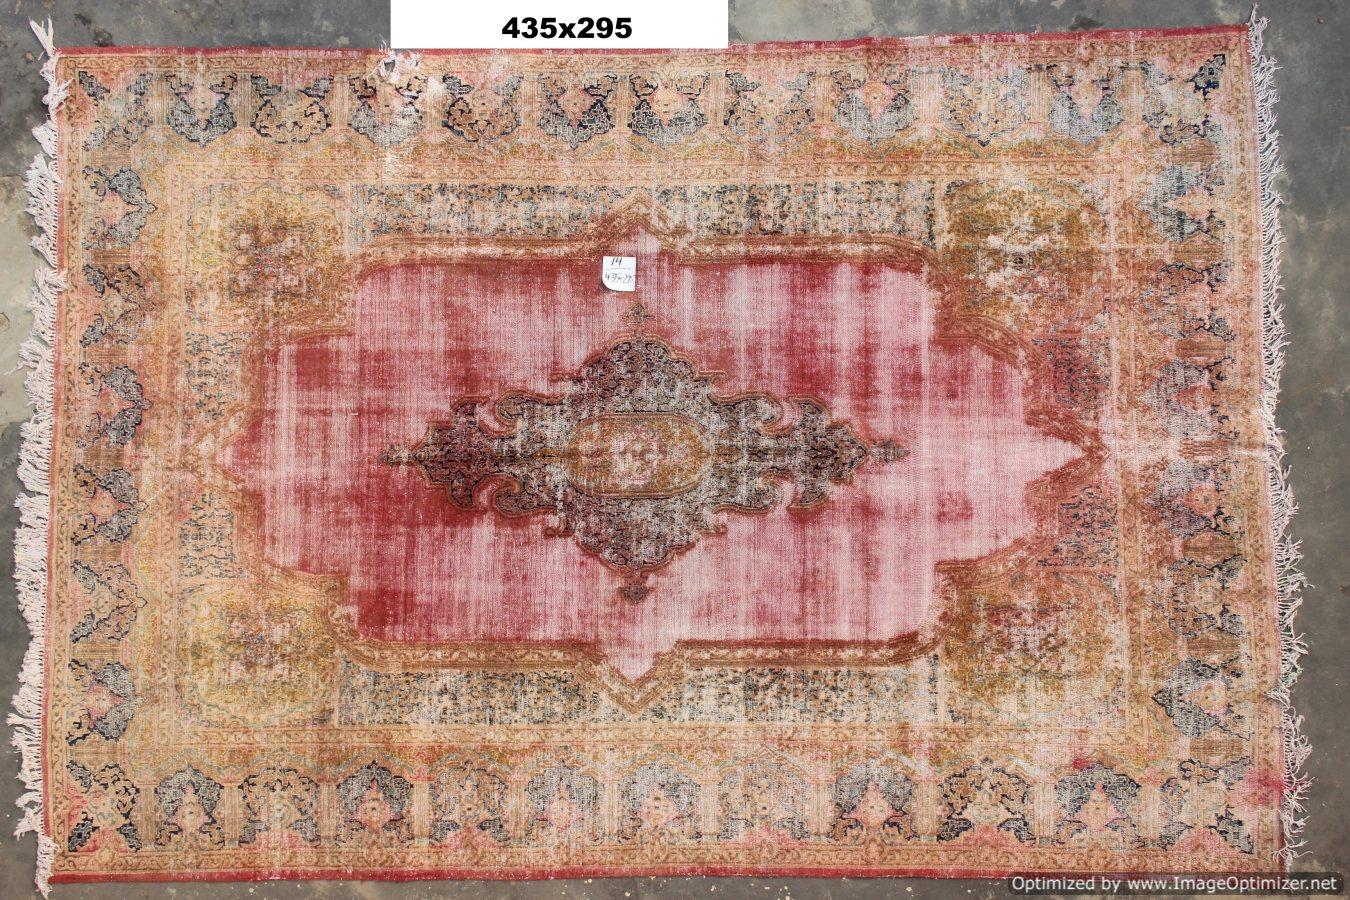 Vintage recoloured perzisch tapijt 14B (435cm x 295cm)